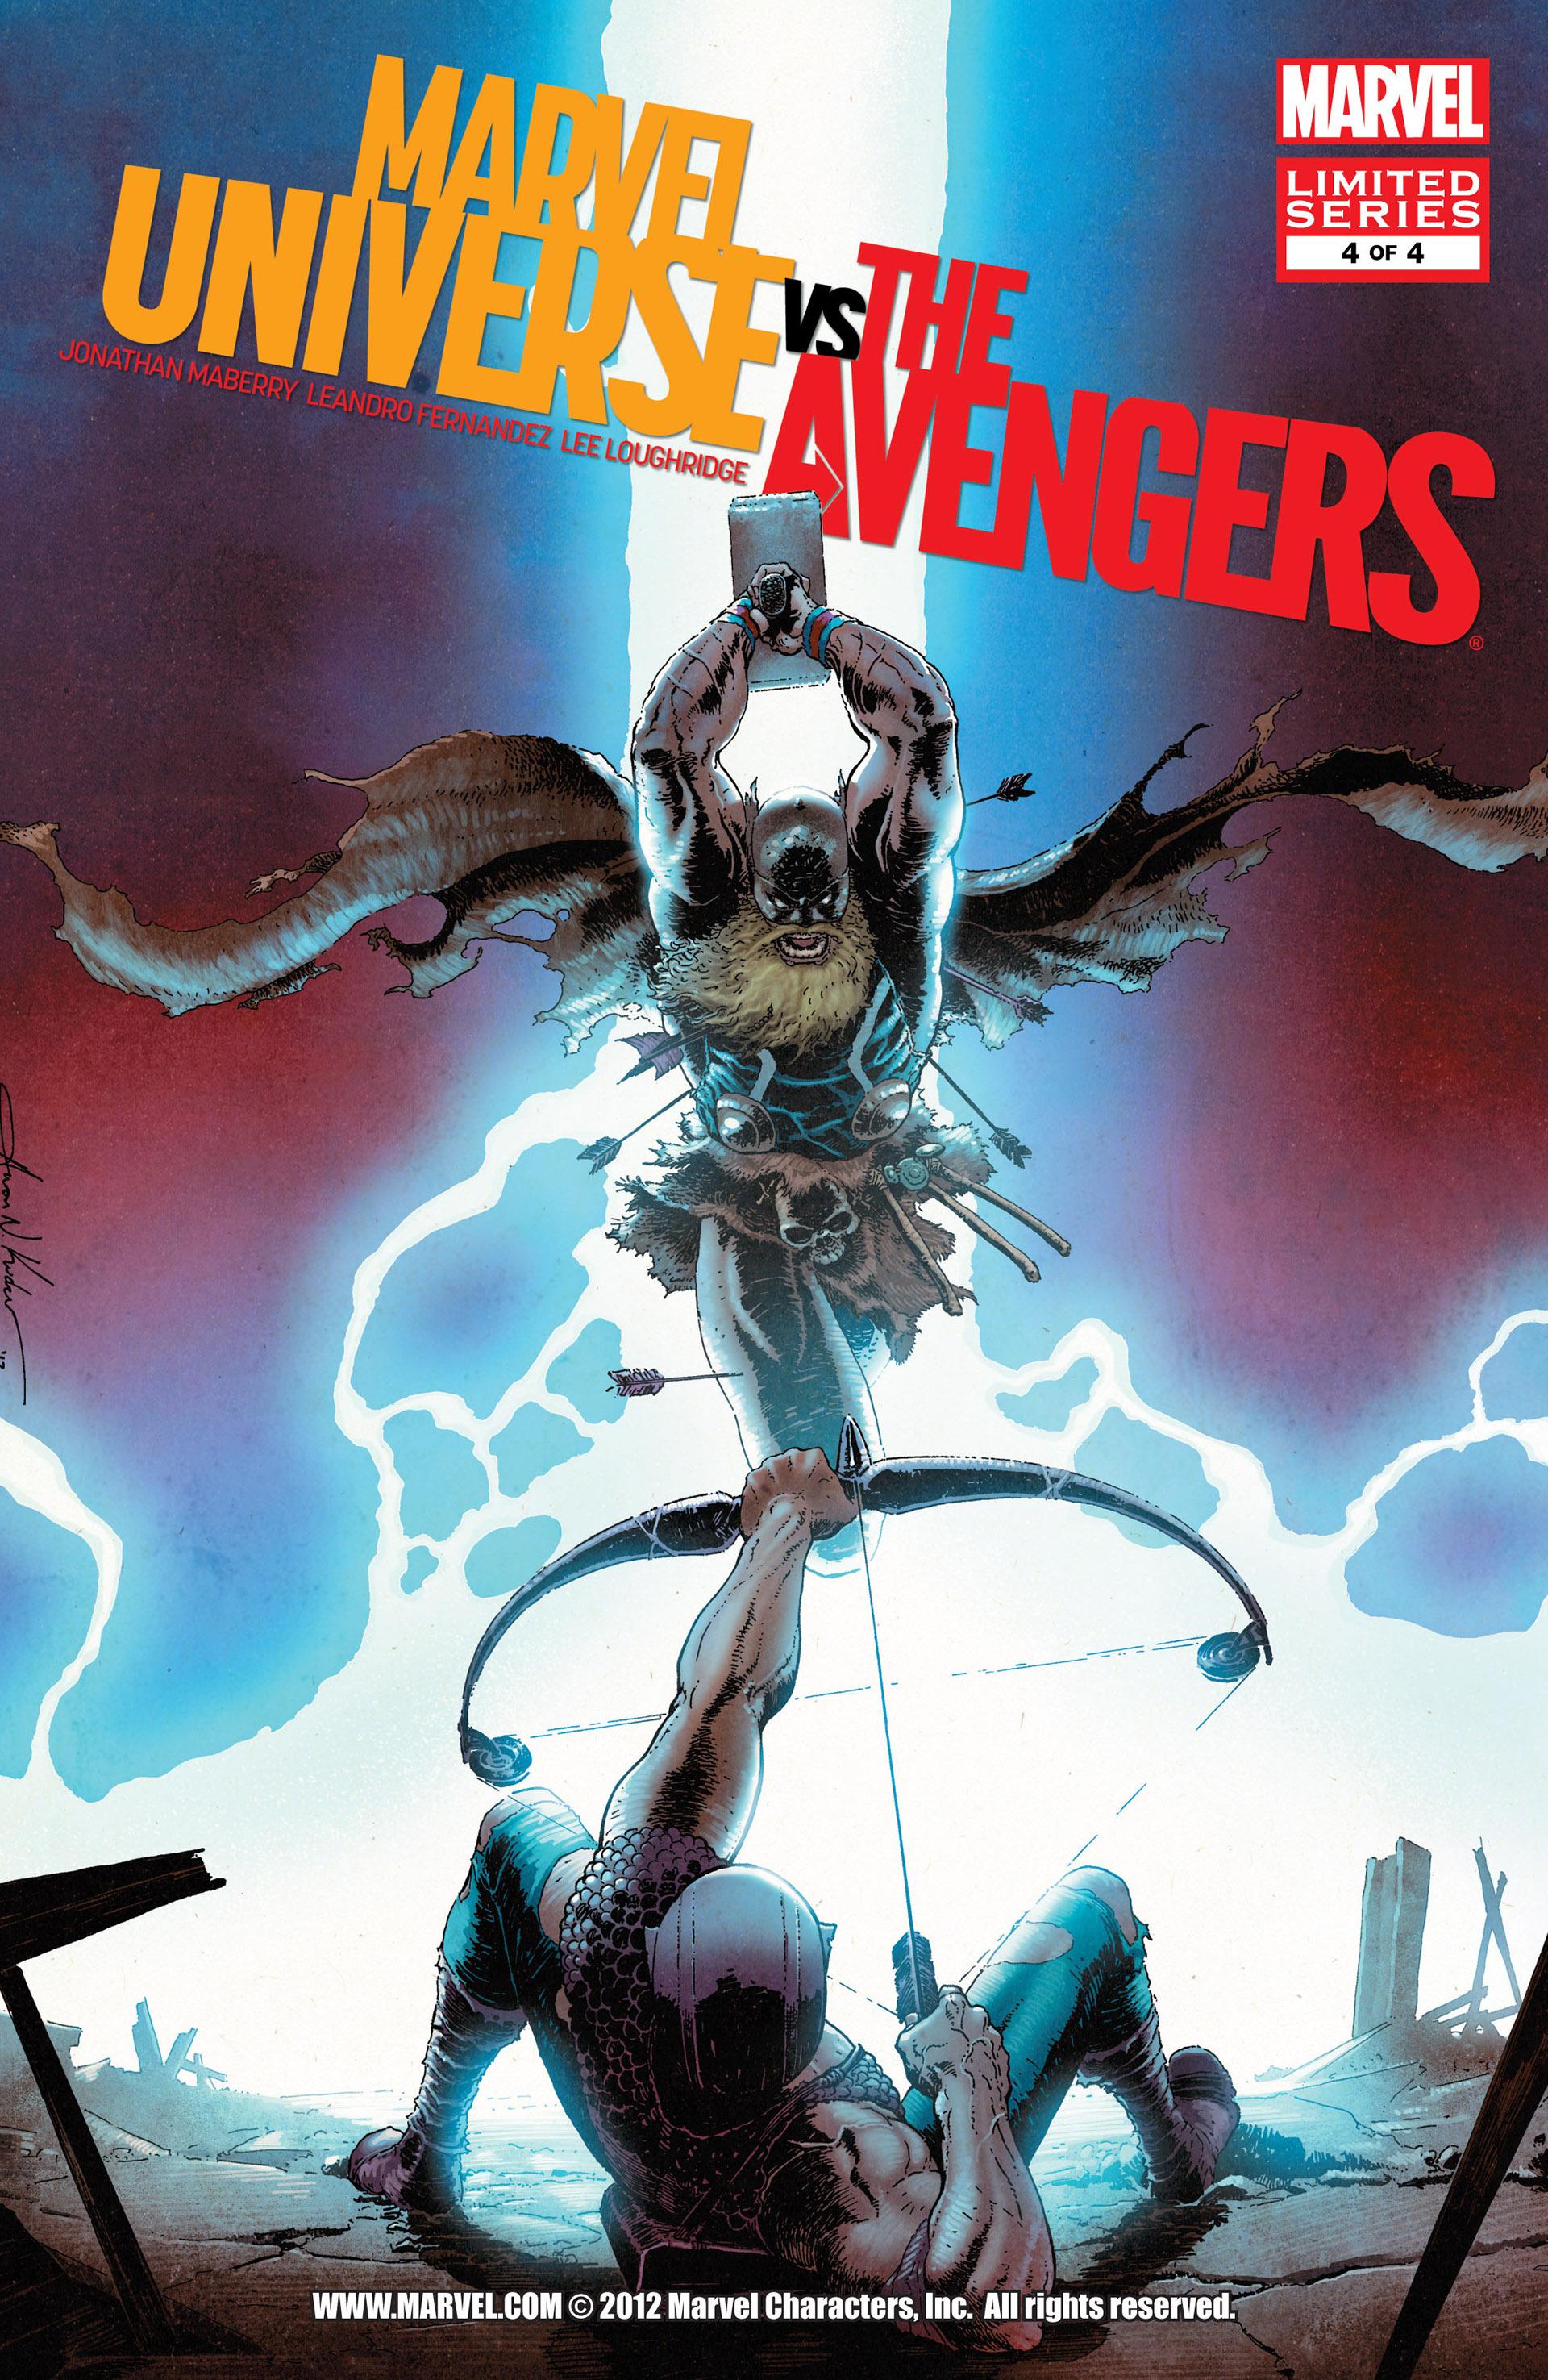 Marvel Universe Vs The Avengers Viewcomic Reading Comics Online For Free 2019